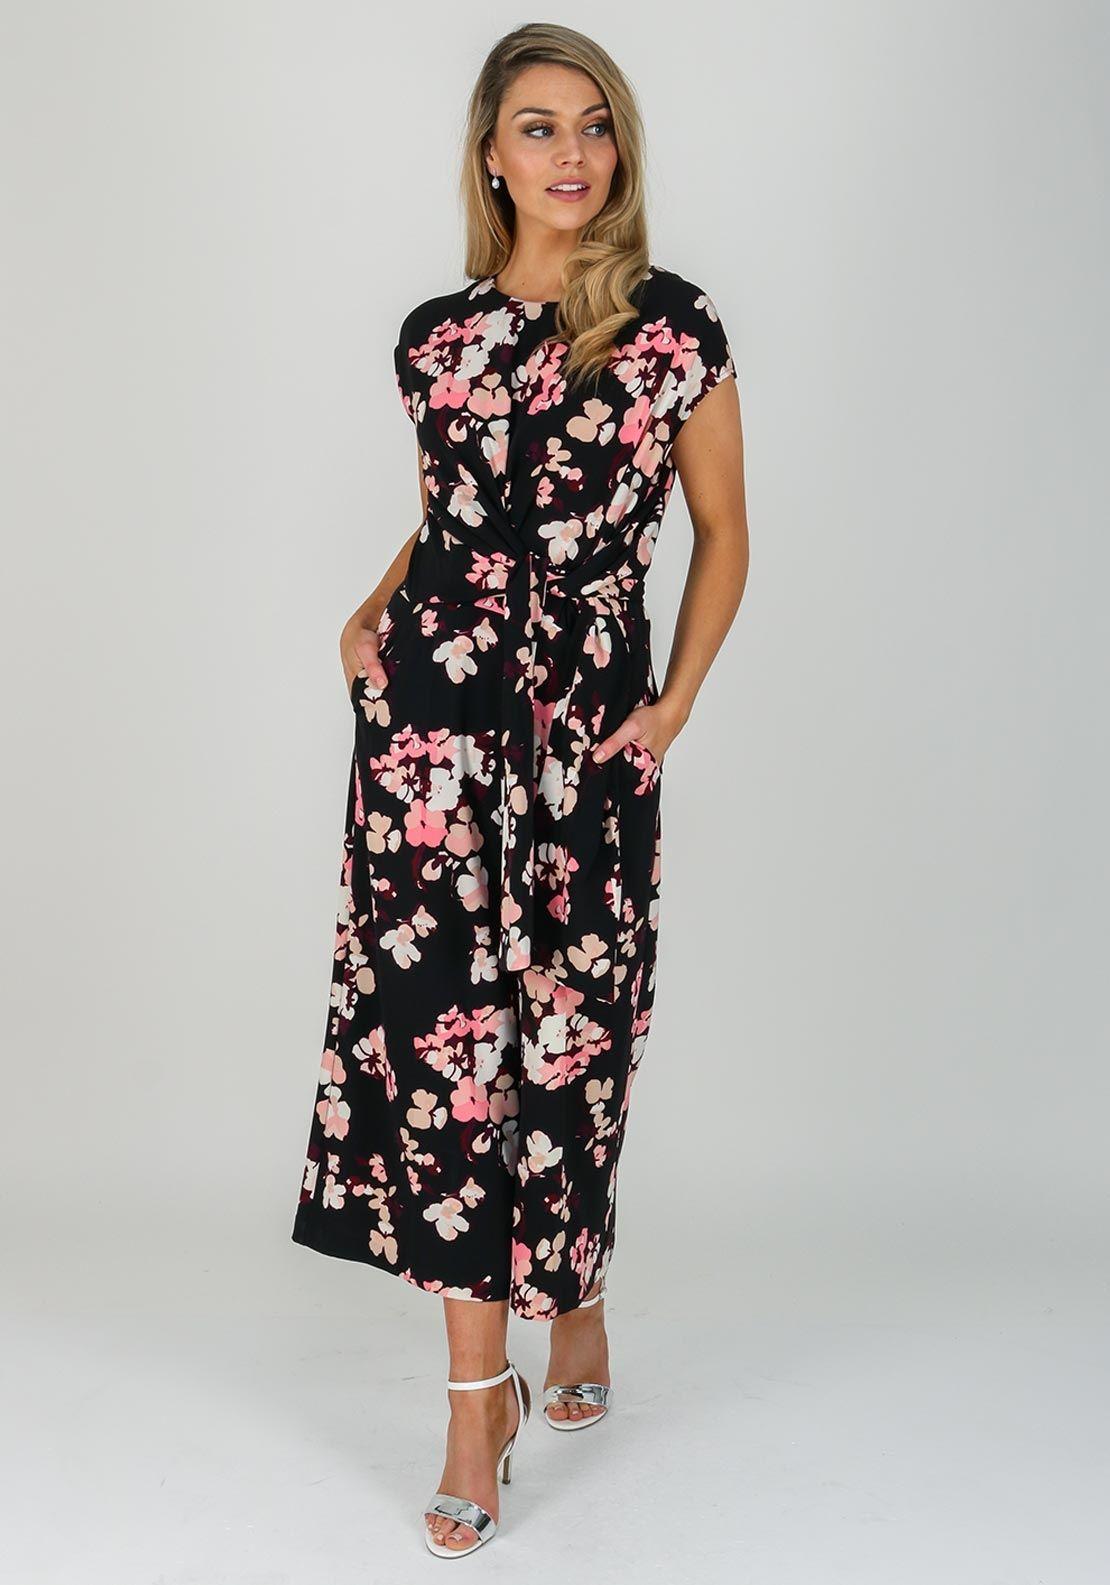 9ec484c1c1a0 Inwear Zhen Floral Wide Leg Jumpsuit